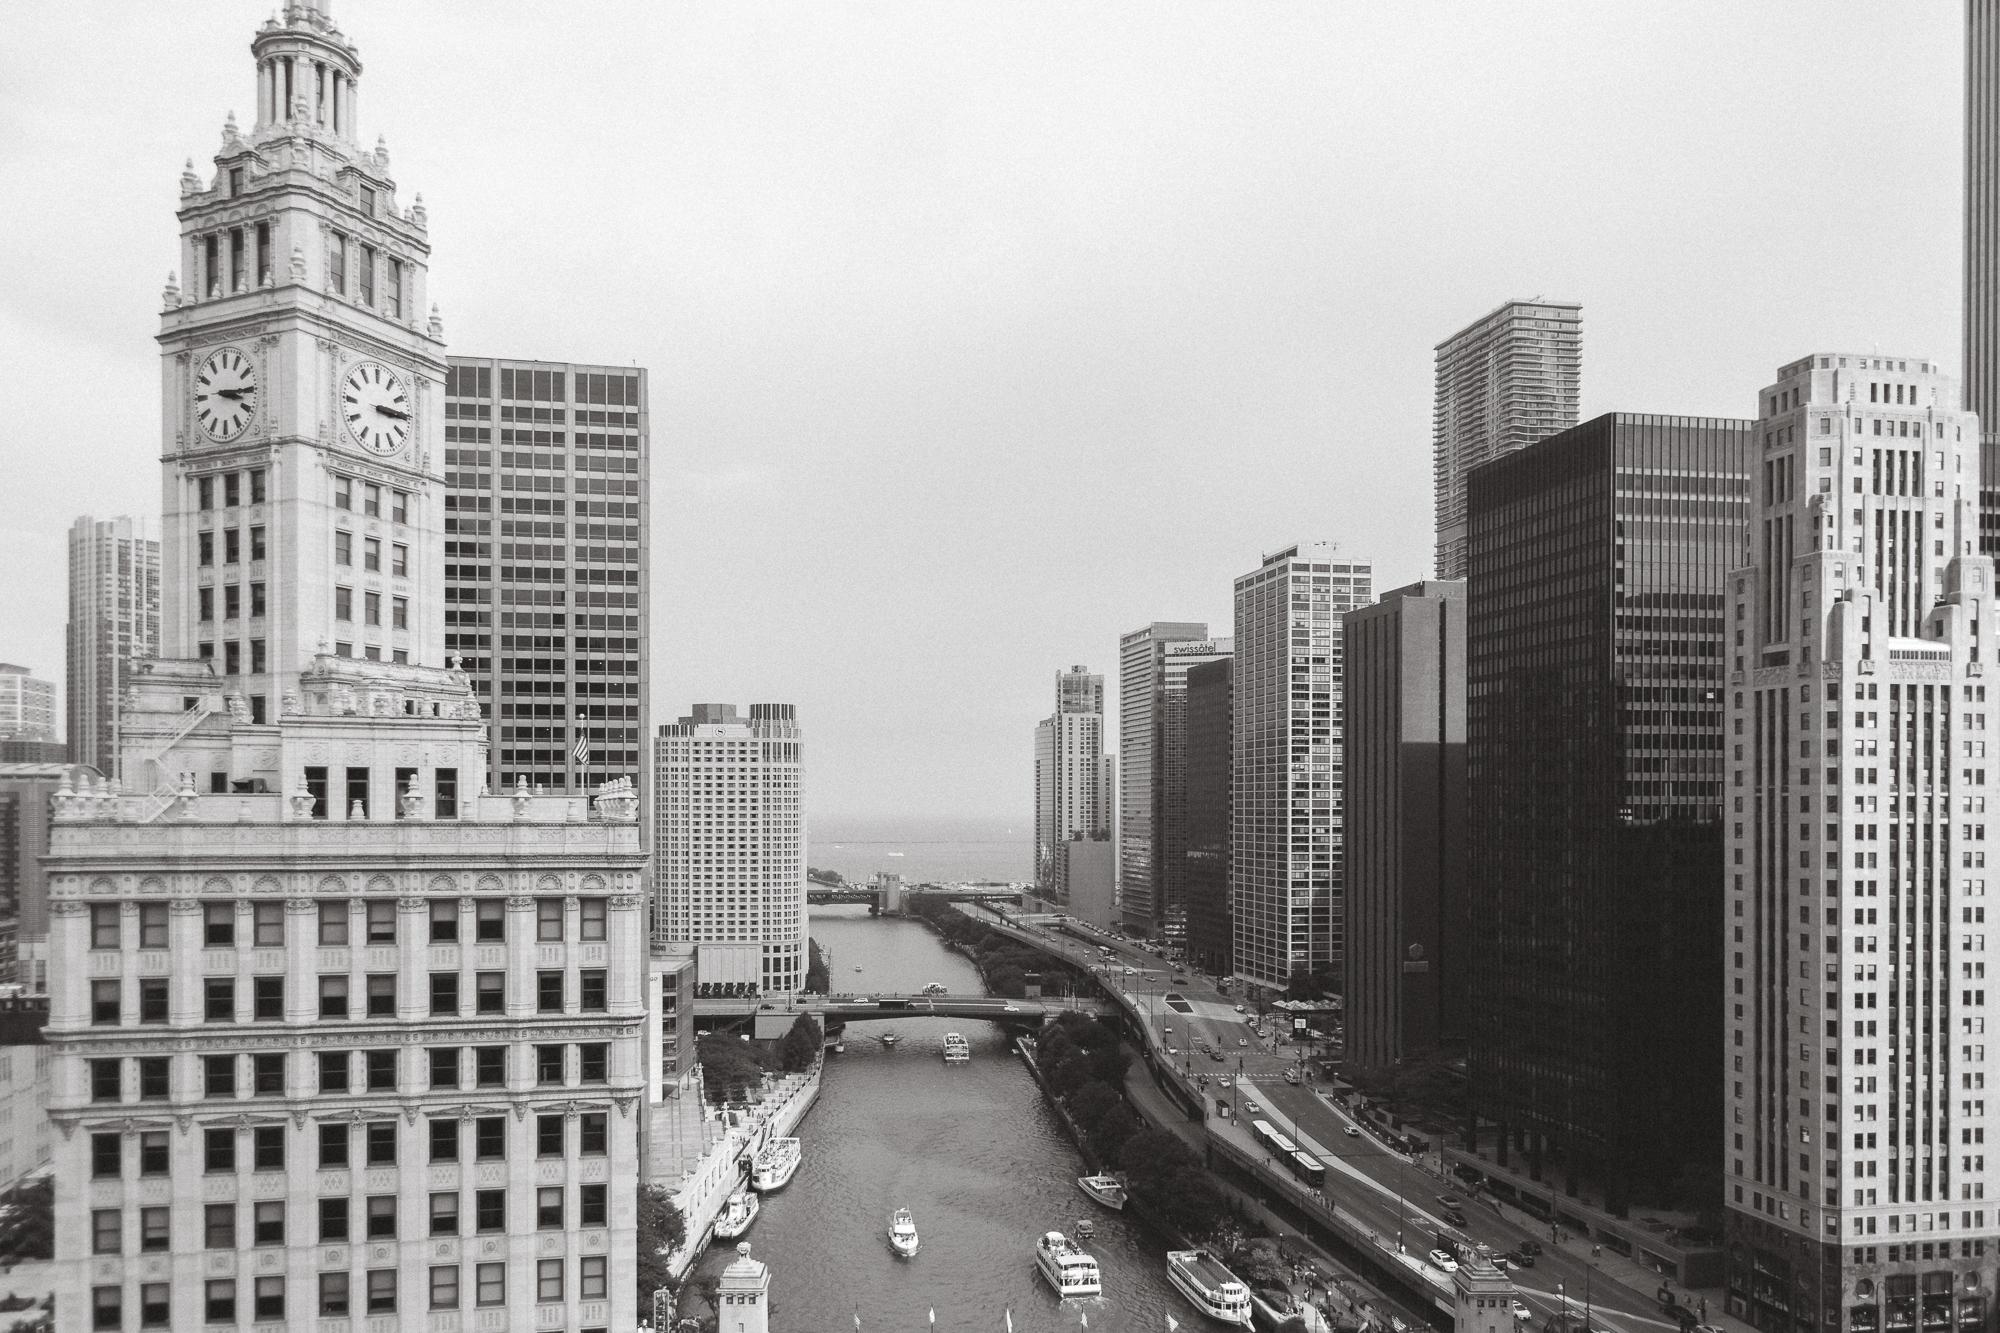 Chicago Illinois - DiBlasio Photography-2.jpg